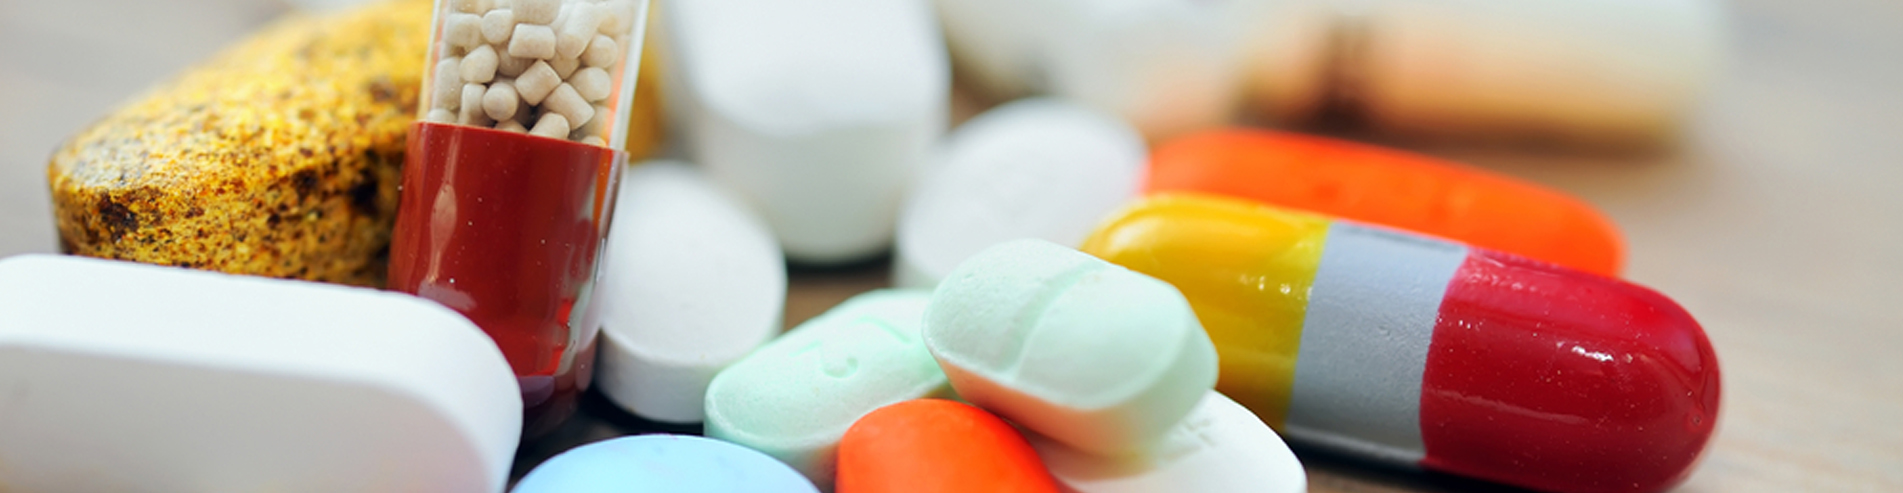 GCS-Global Clinical Supplies